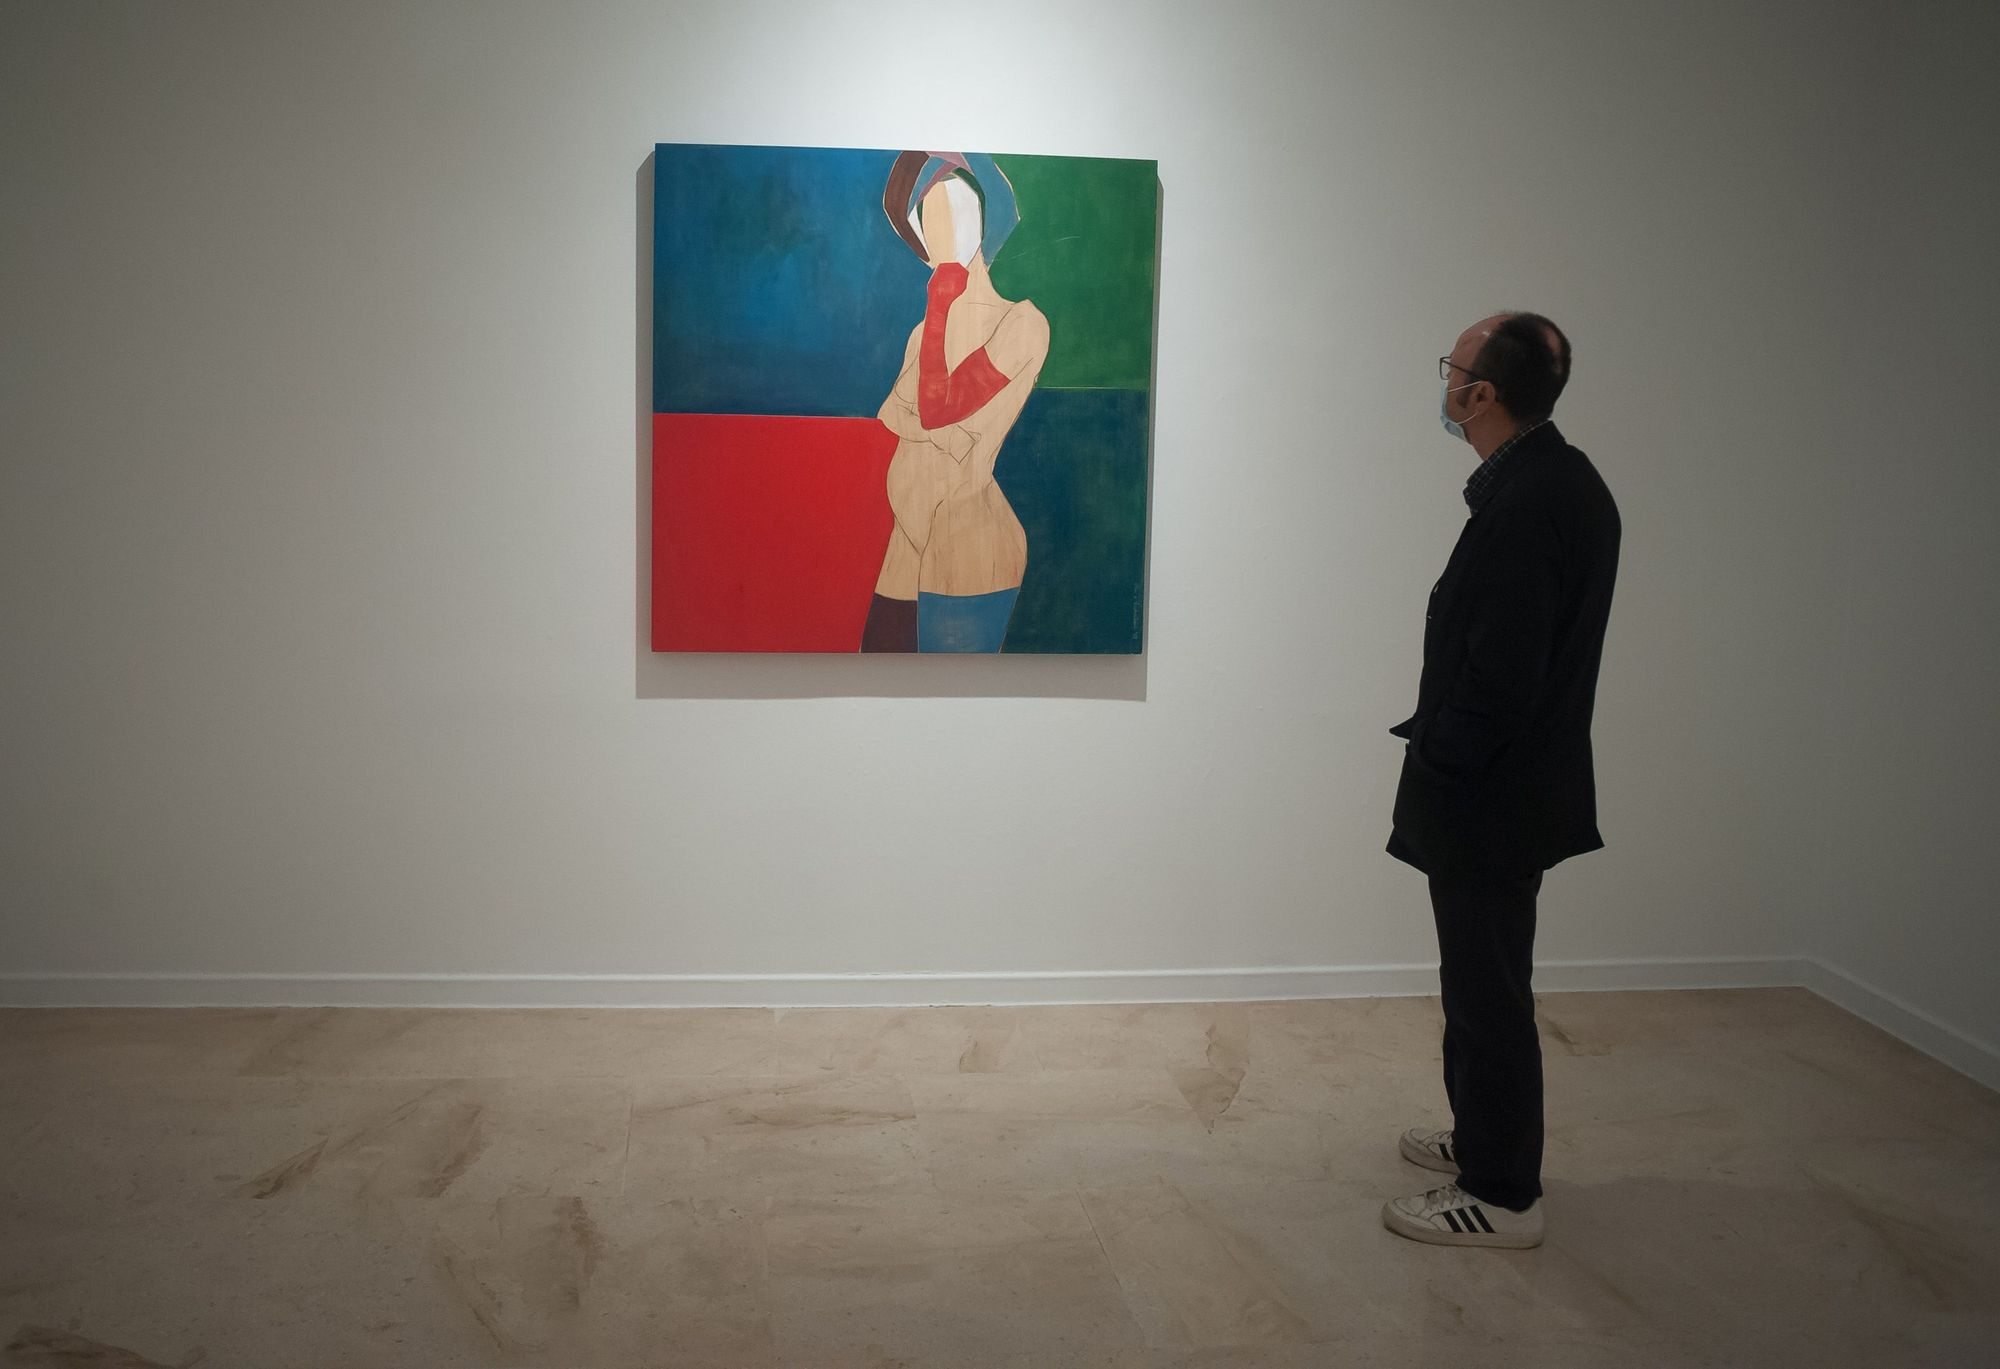 Exposición de Ana S. Valderrábanos en el CAC Málaga